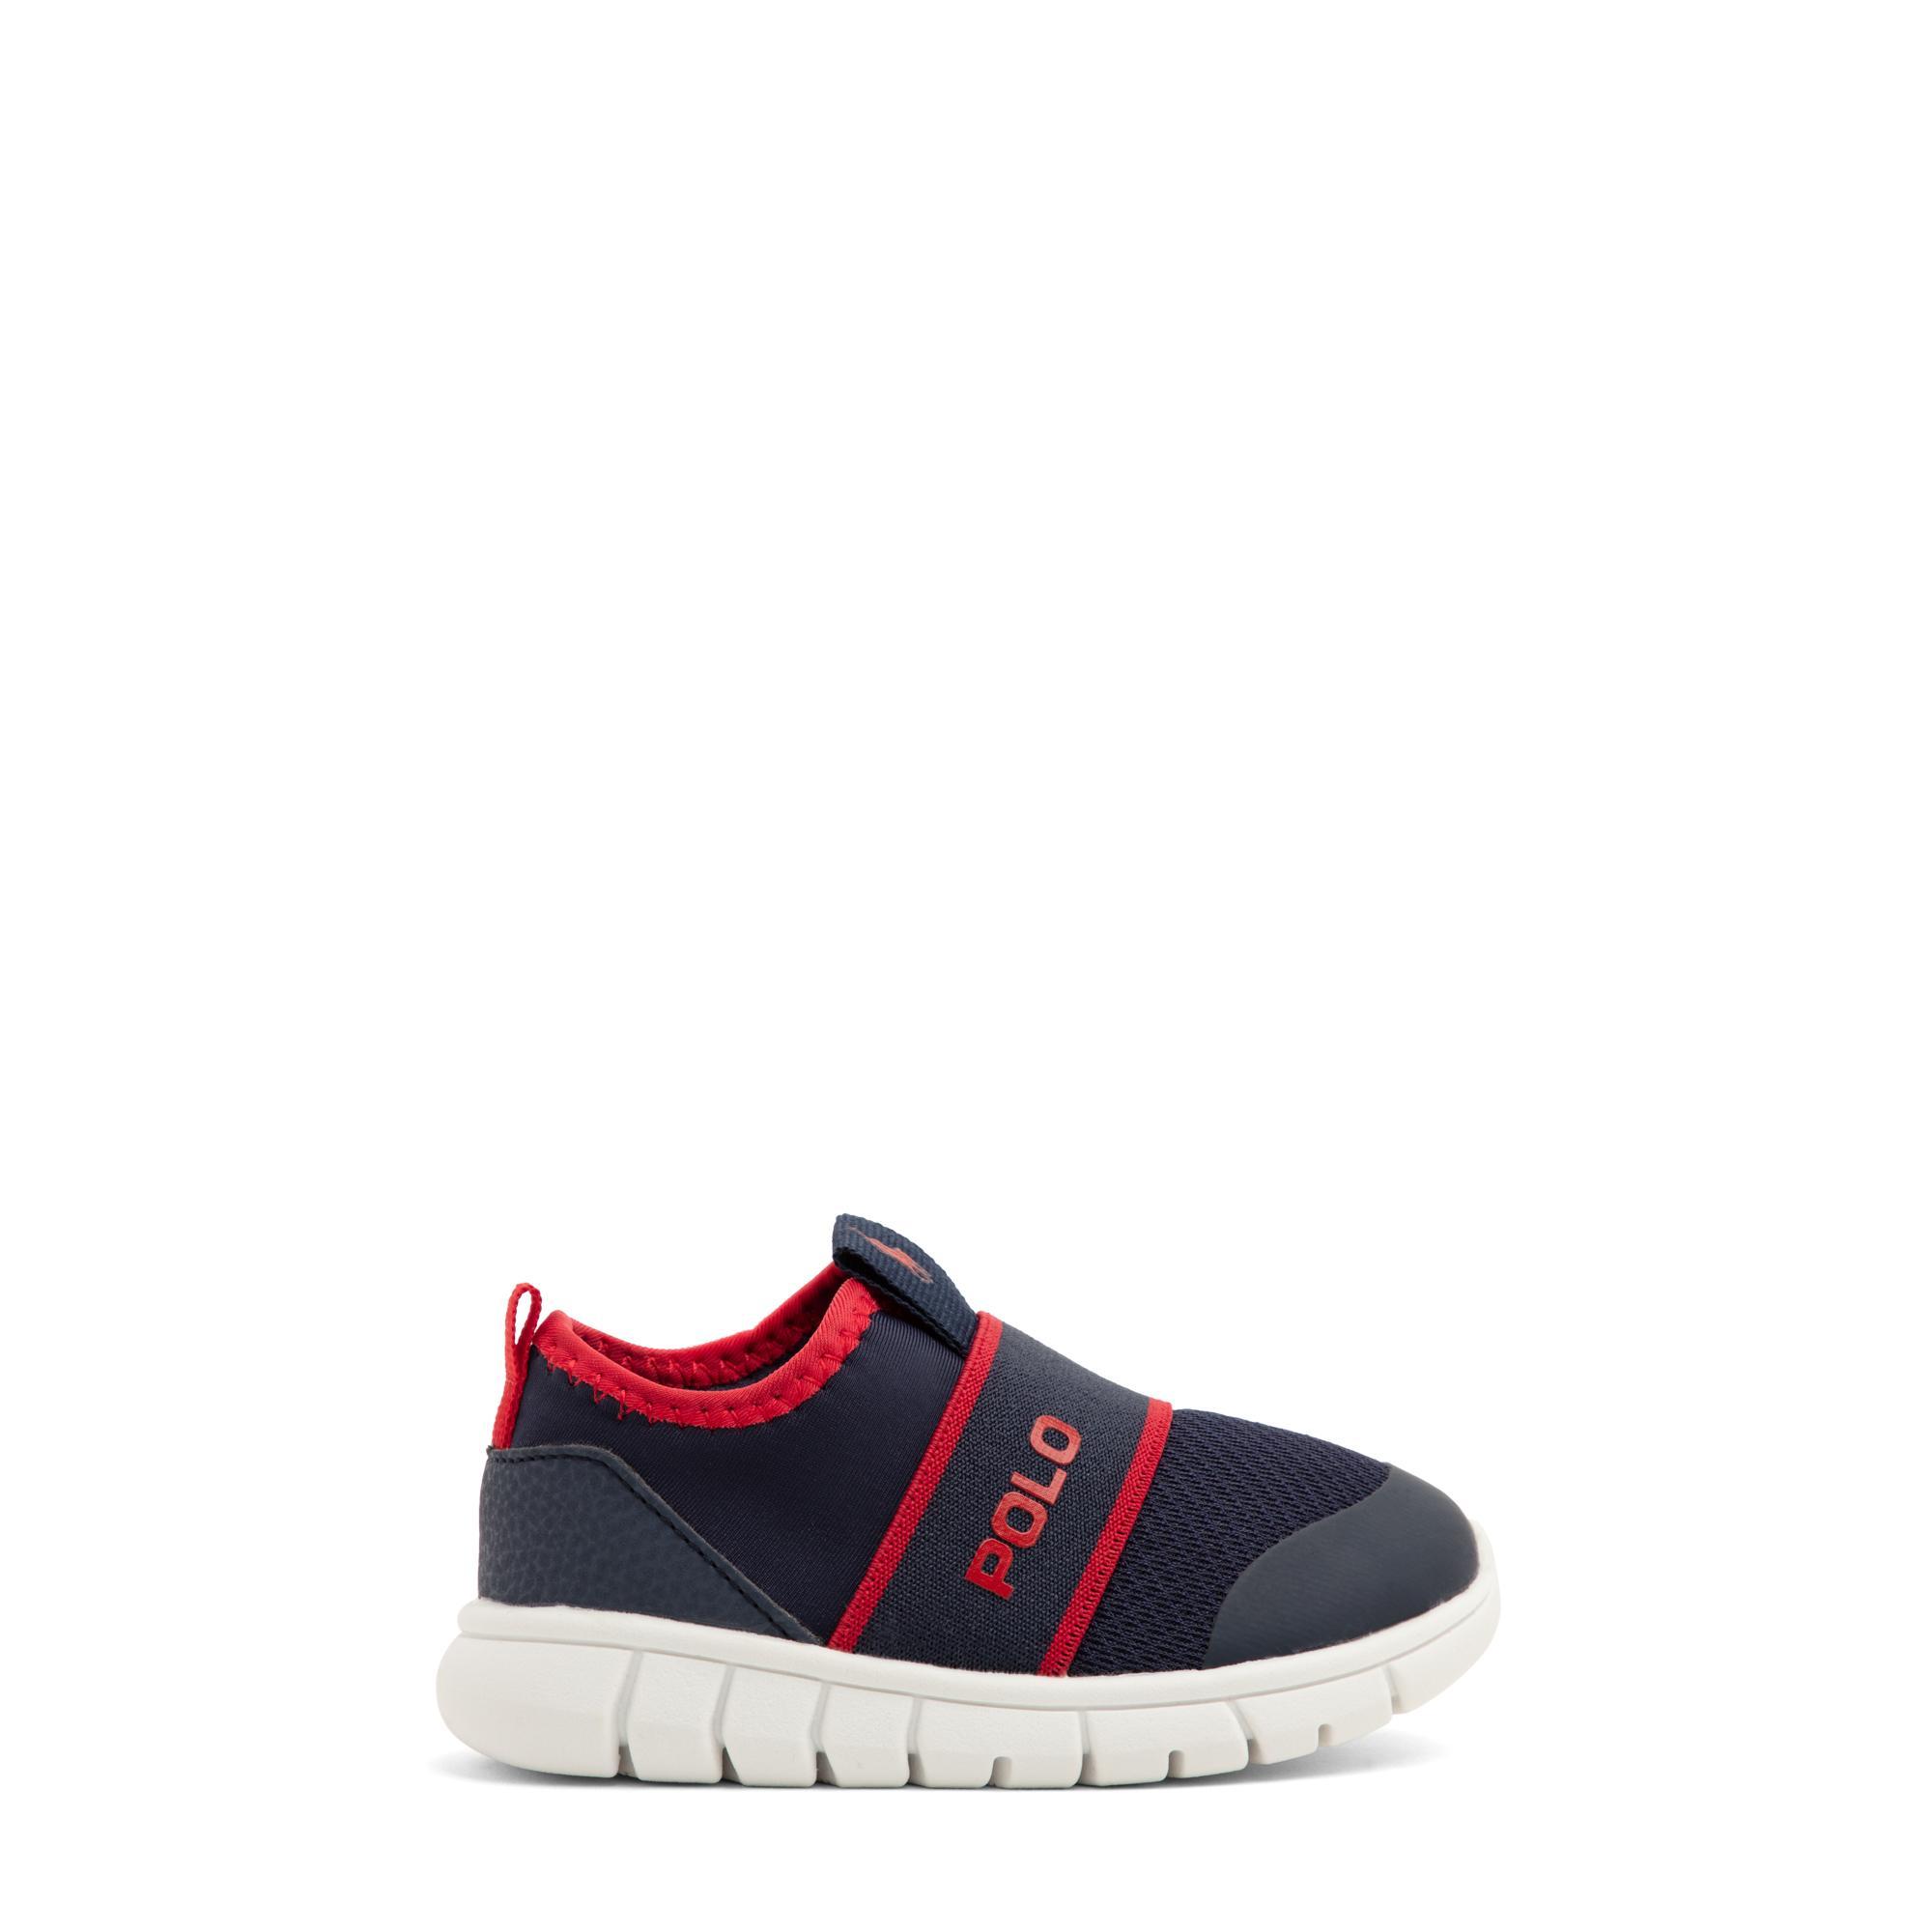 Barnes II sneakers